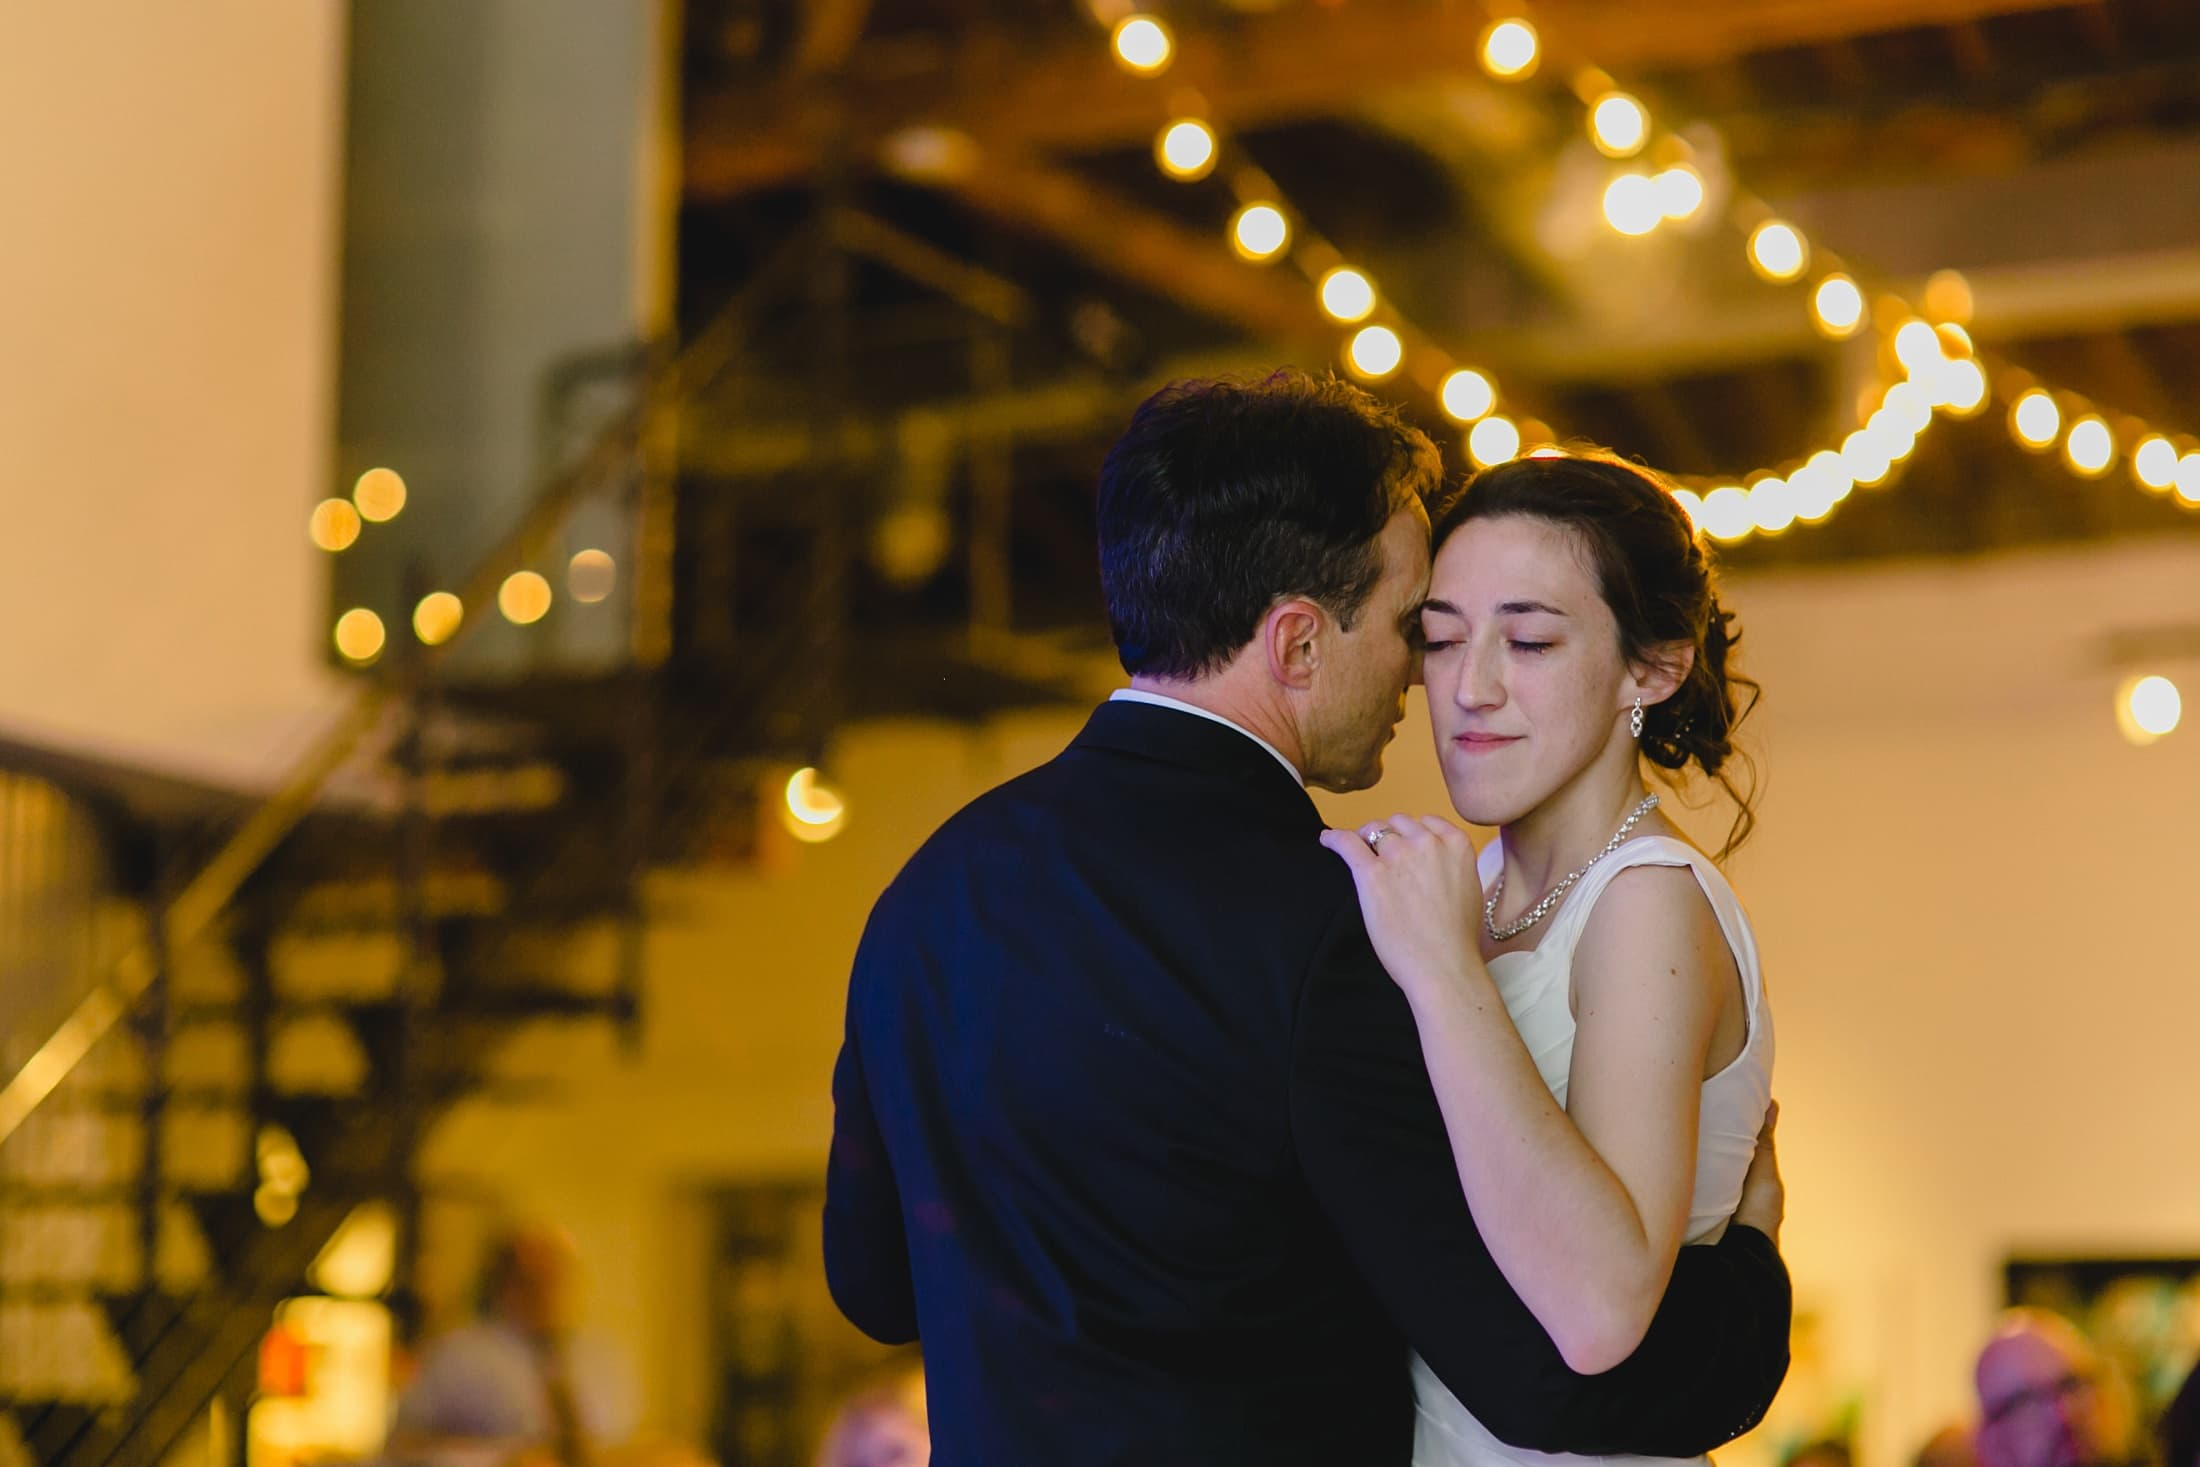 The Monorchid wedding reception photos